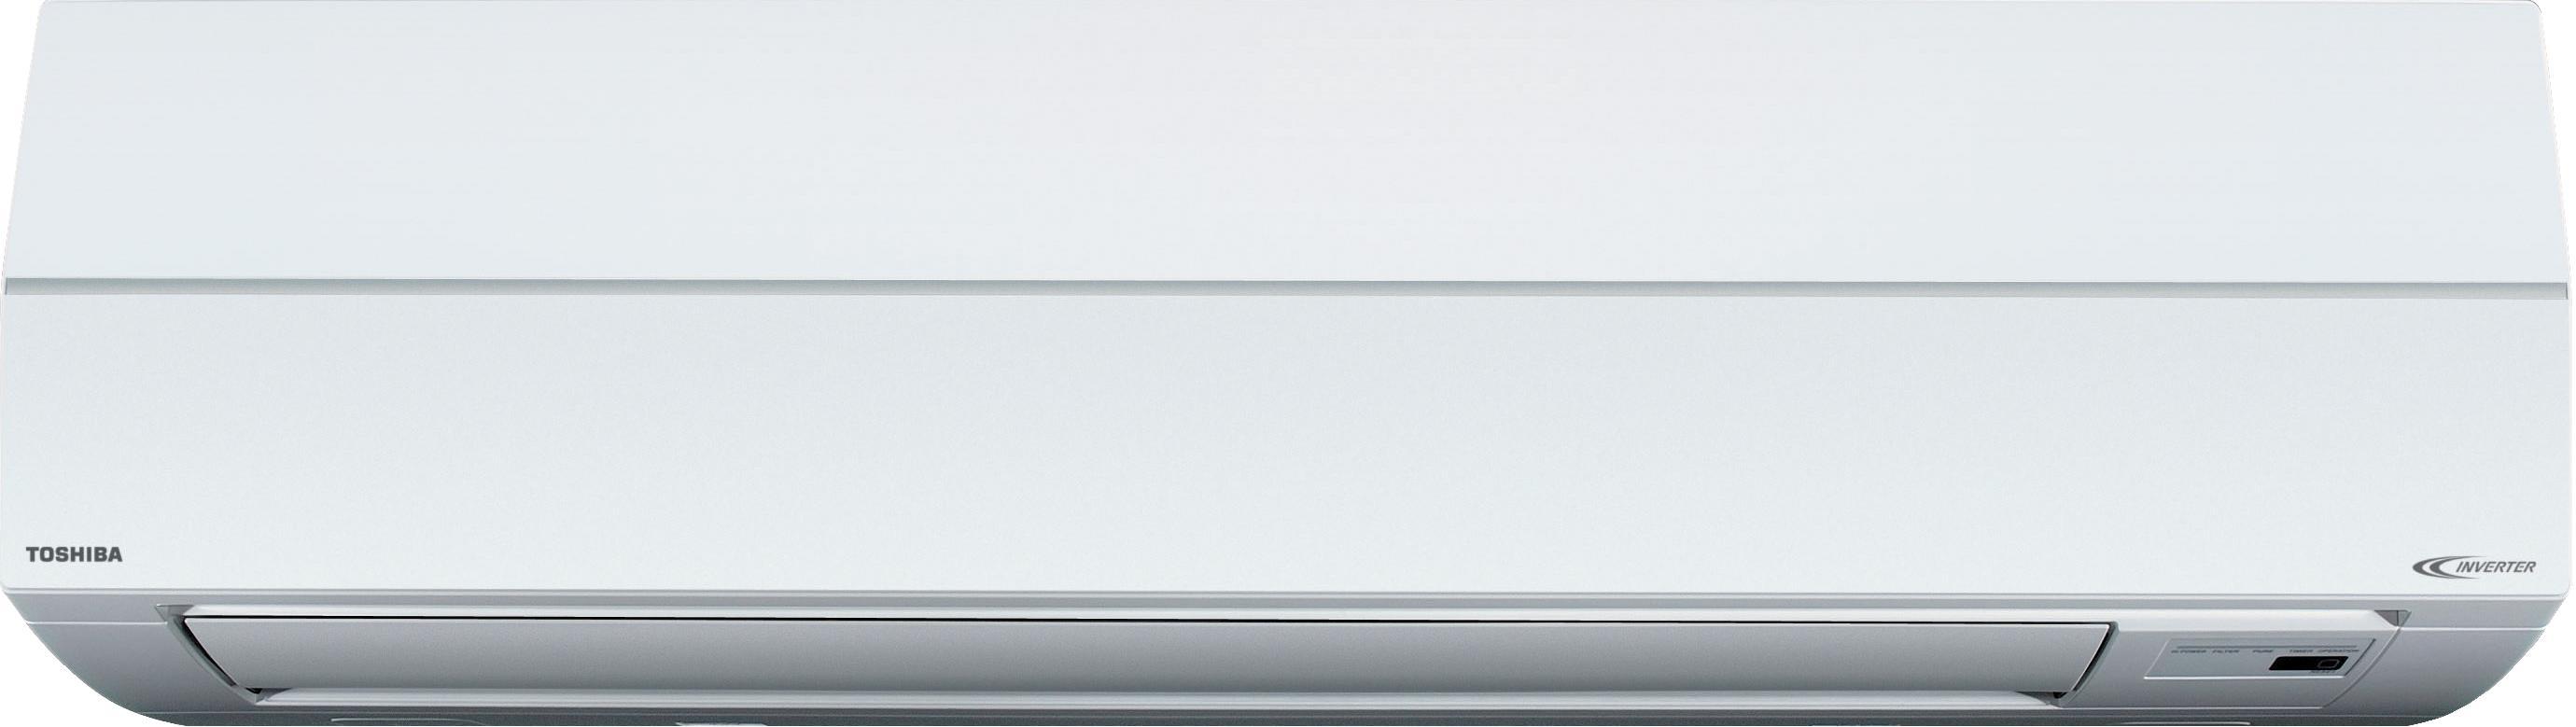 Toshiba RAS-10SKV-Е2